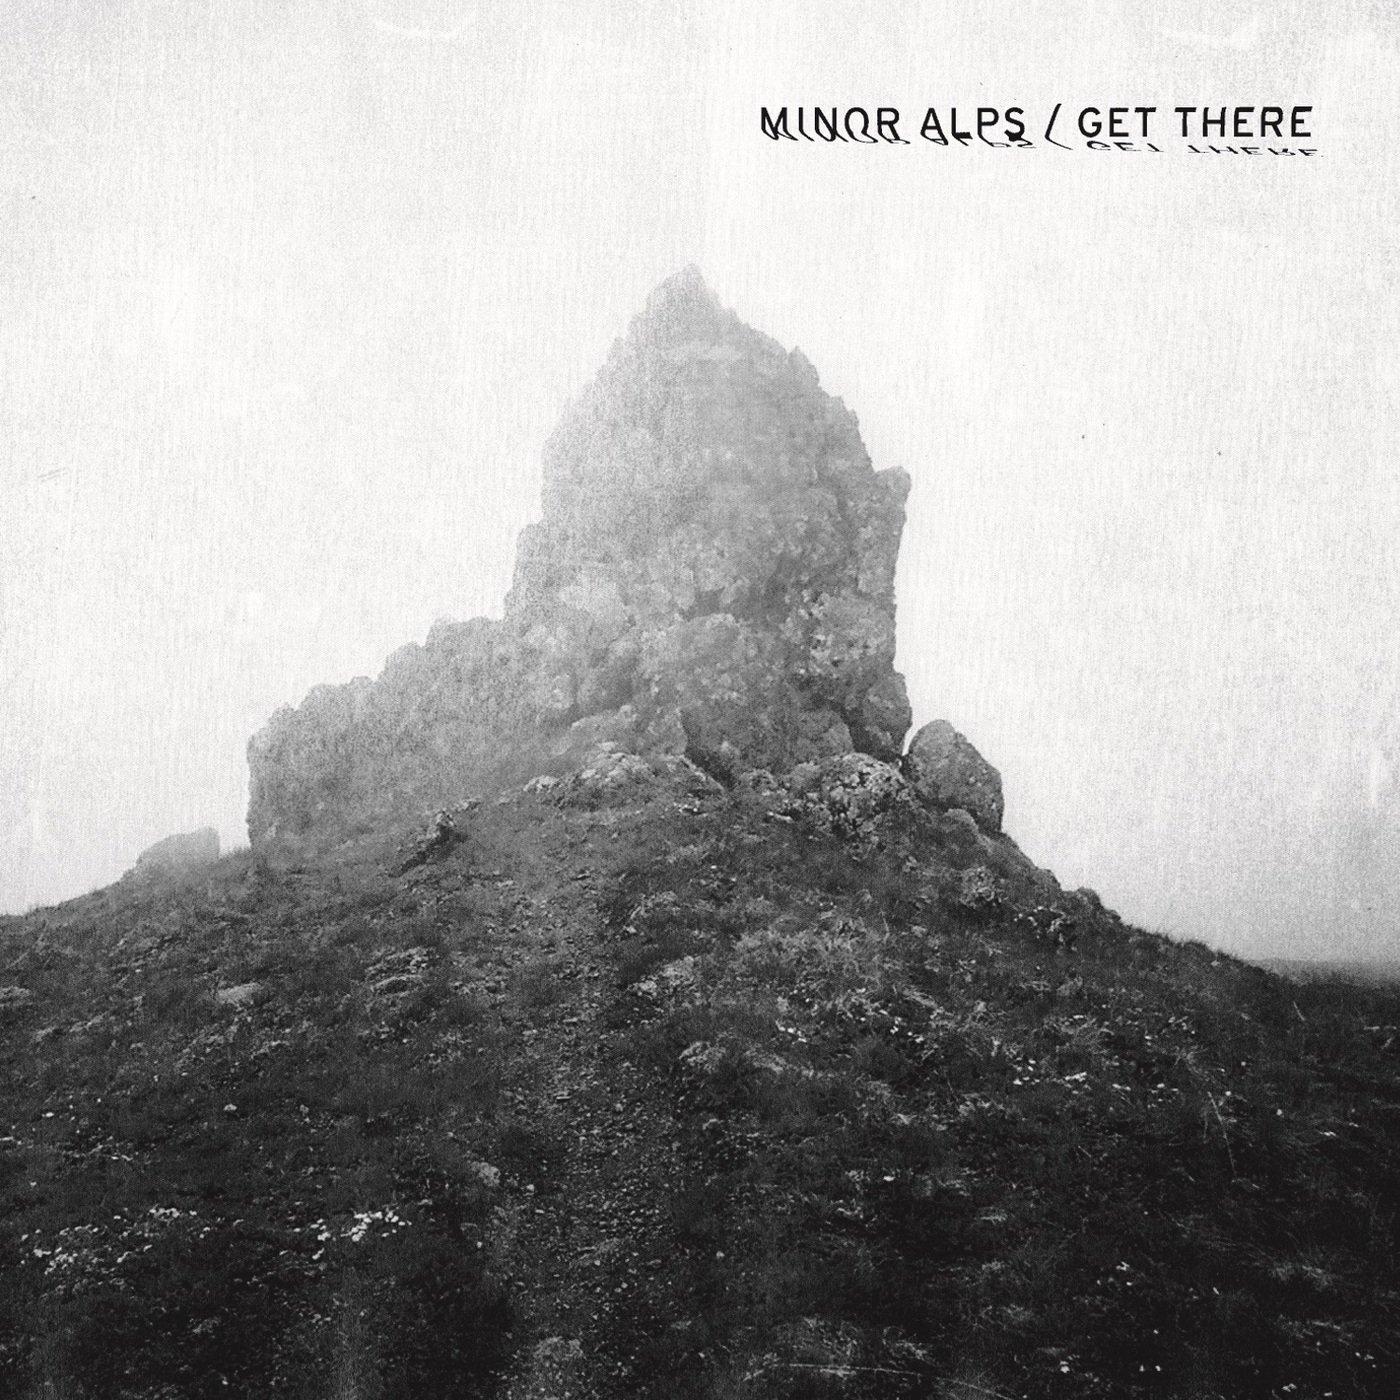 Vinilo : Minor Alps - Get There (LP Vinyl)